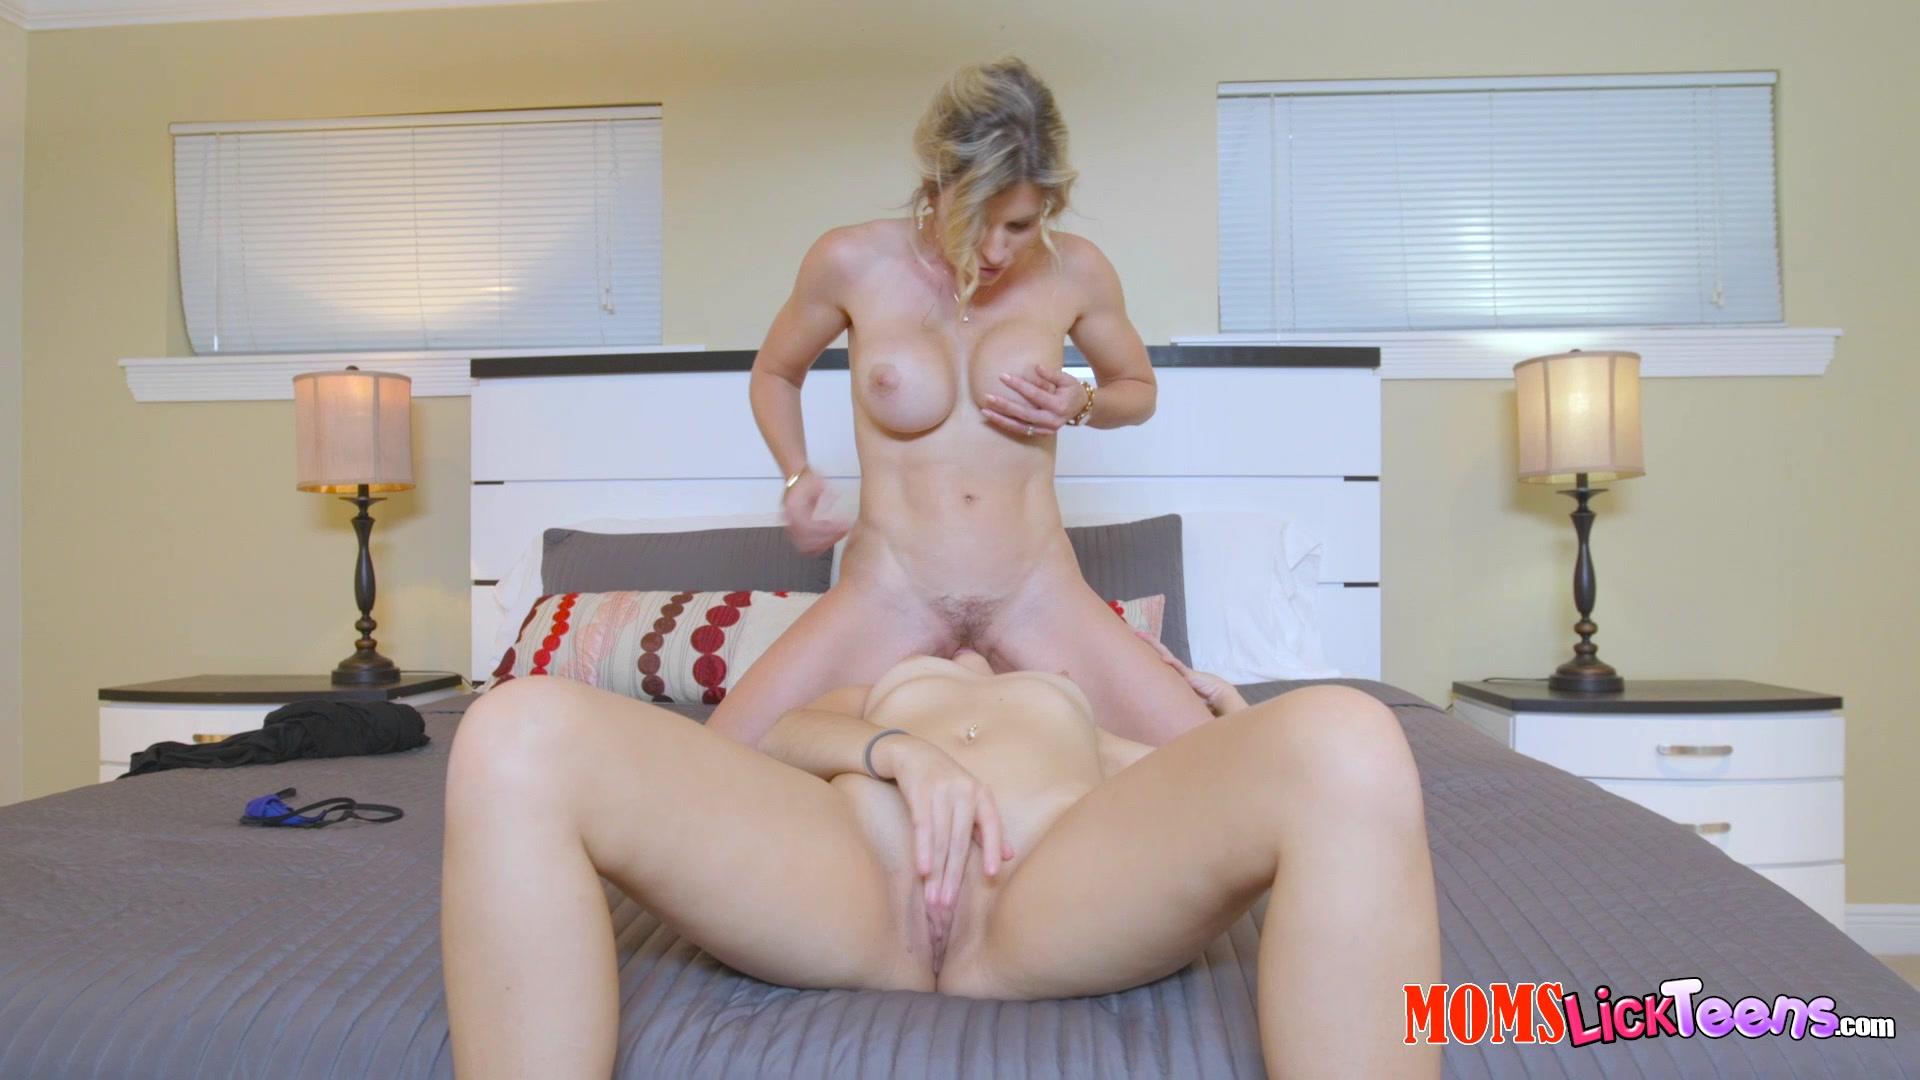 Naughty step mom handjob mobile porno videos_6090